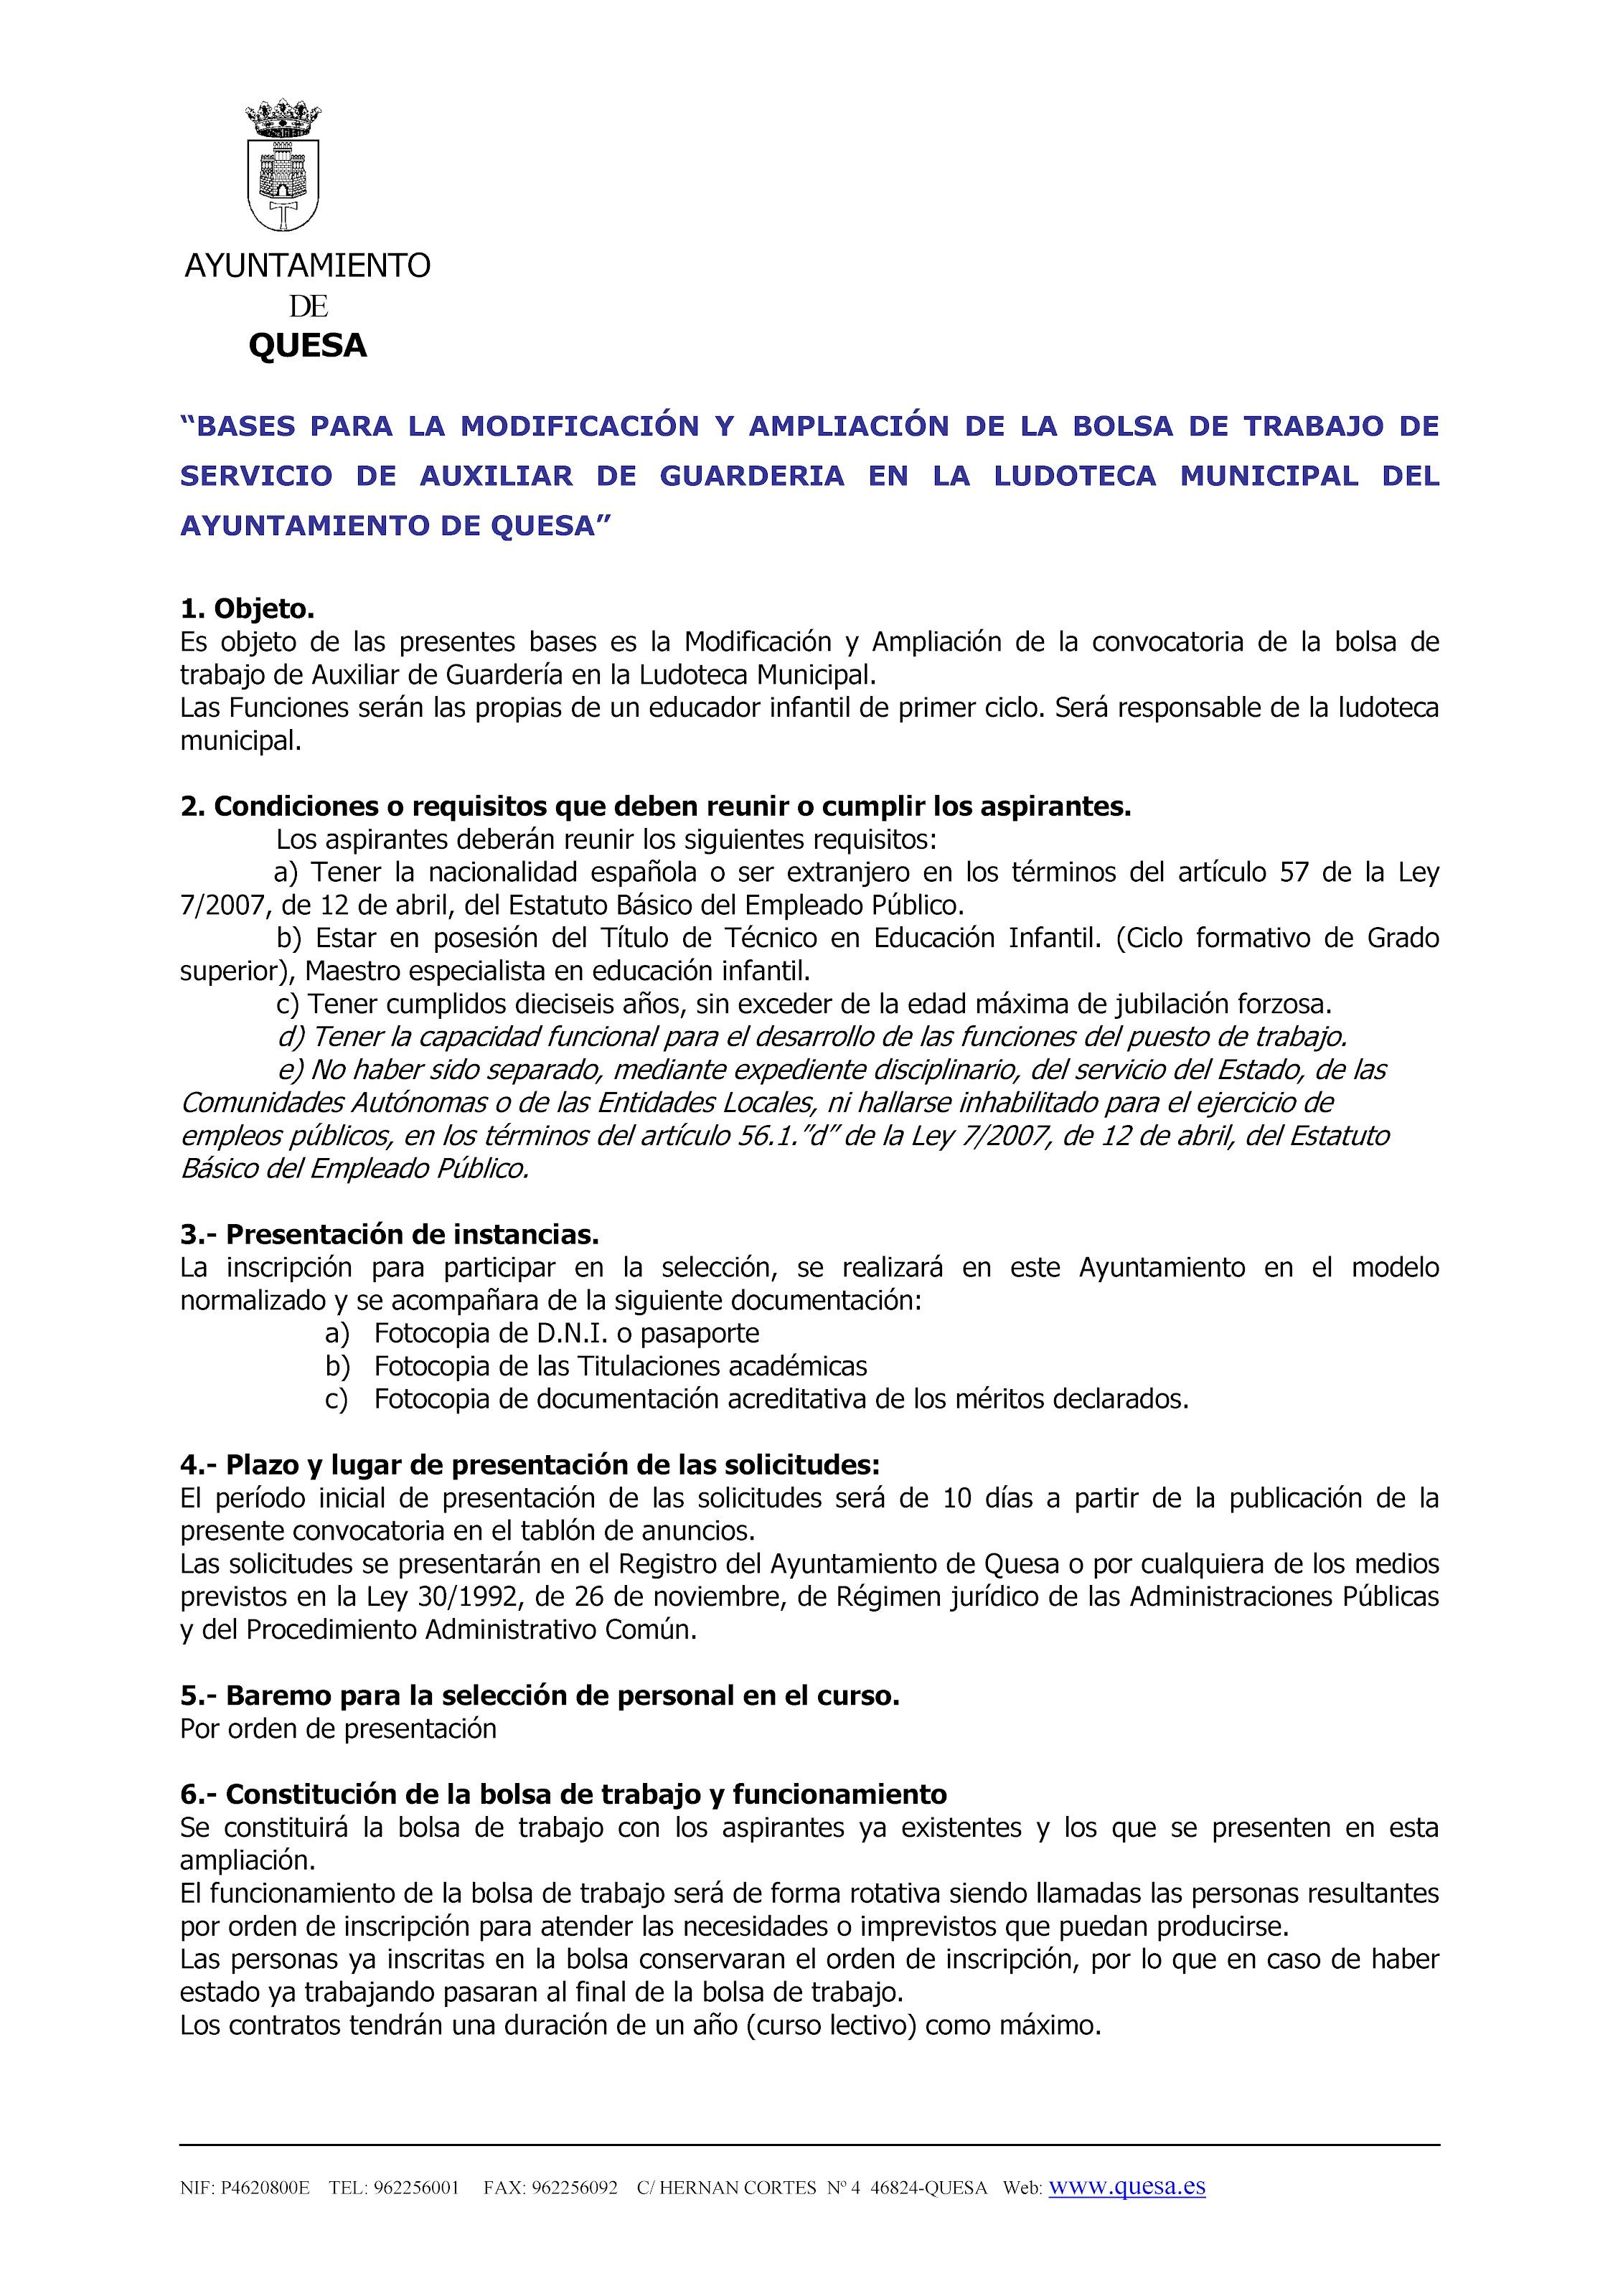 Bases Bolsa de Trabajo Servicio Auxiliar de Guardera en Ludoteca Municipal